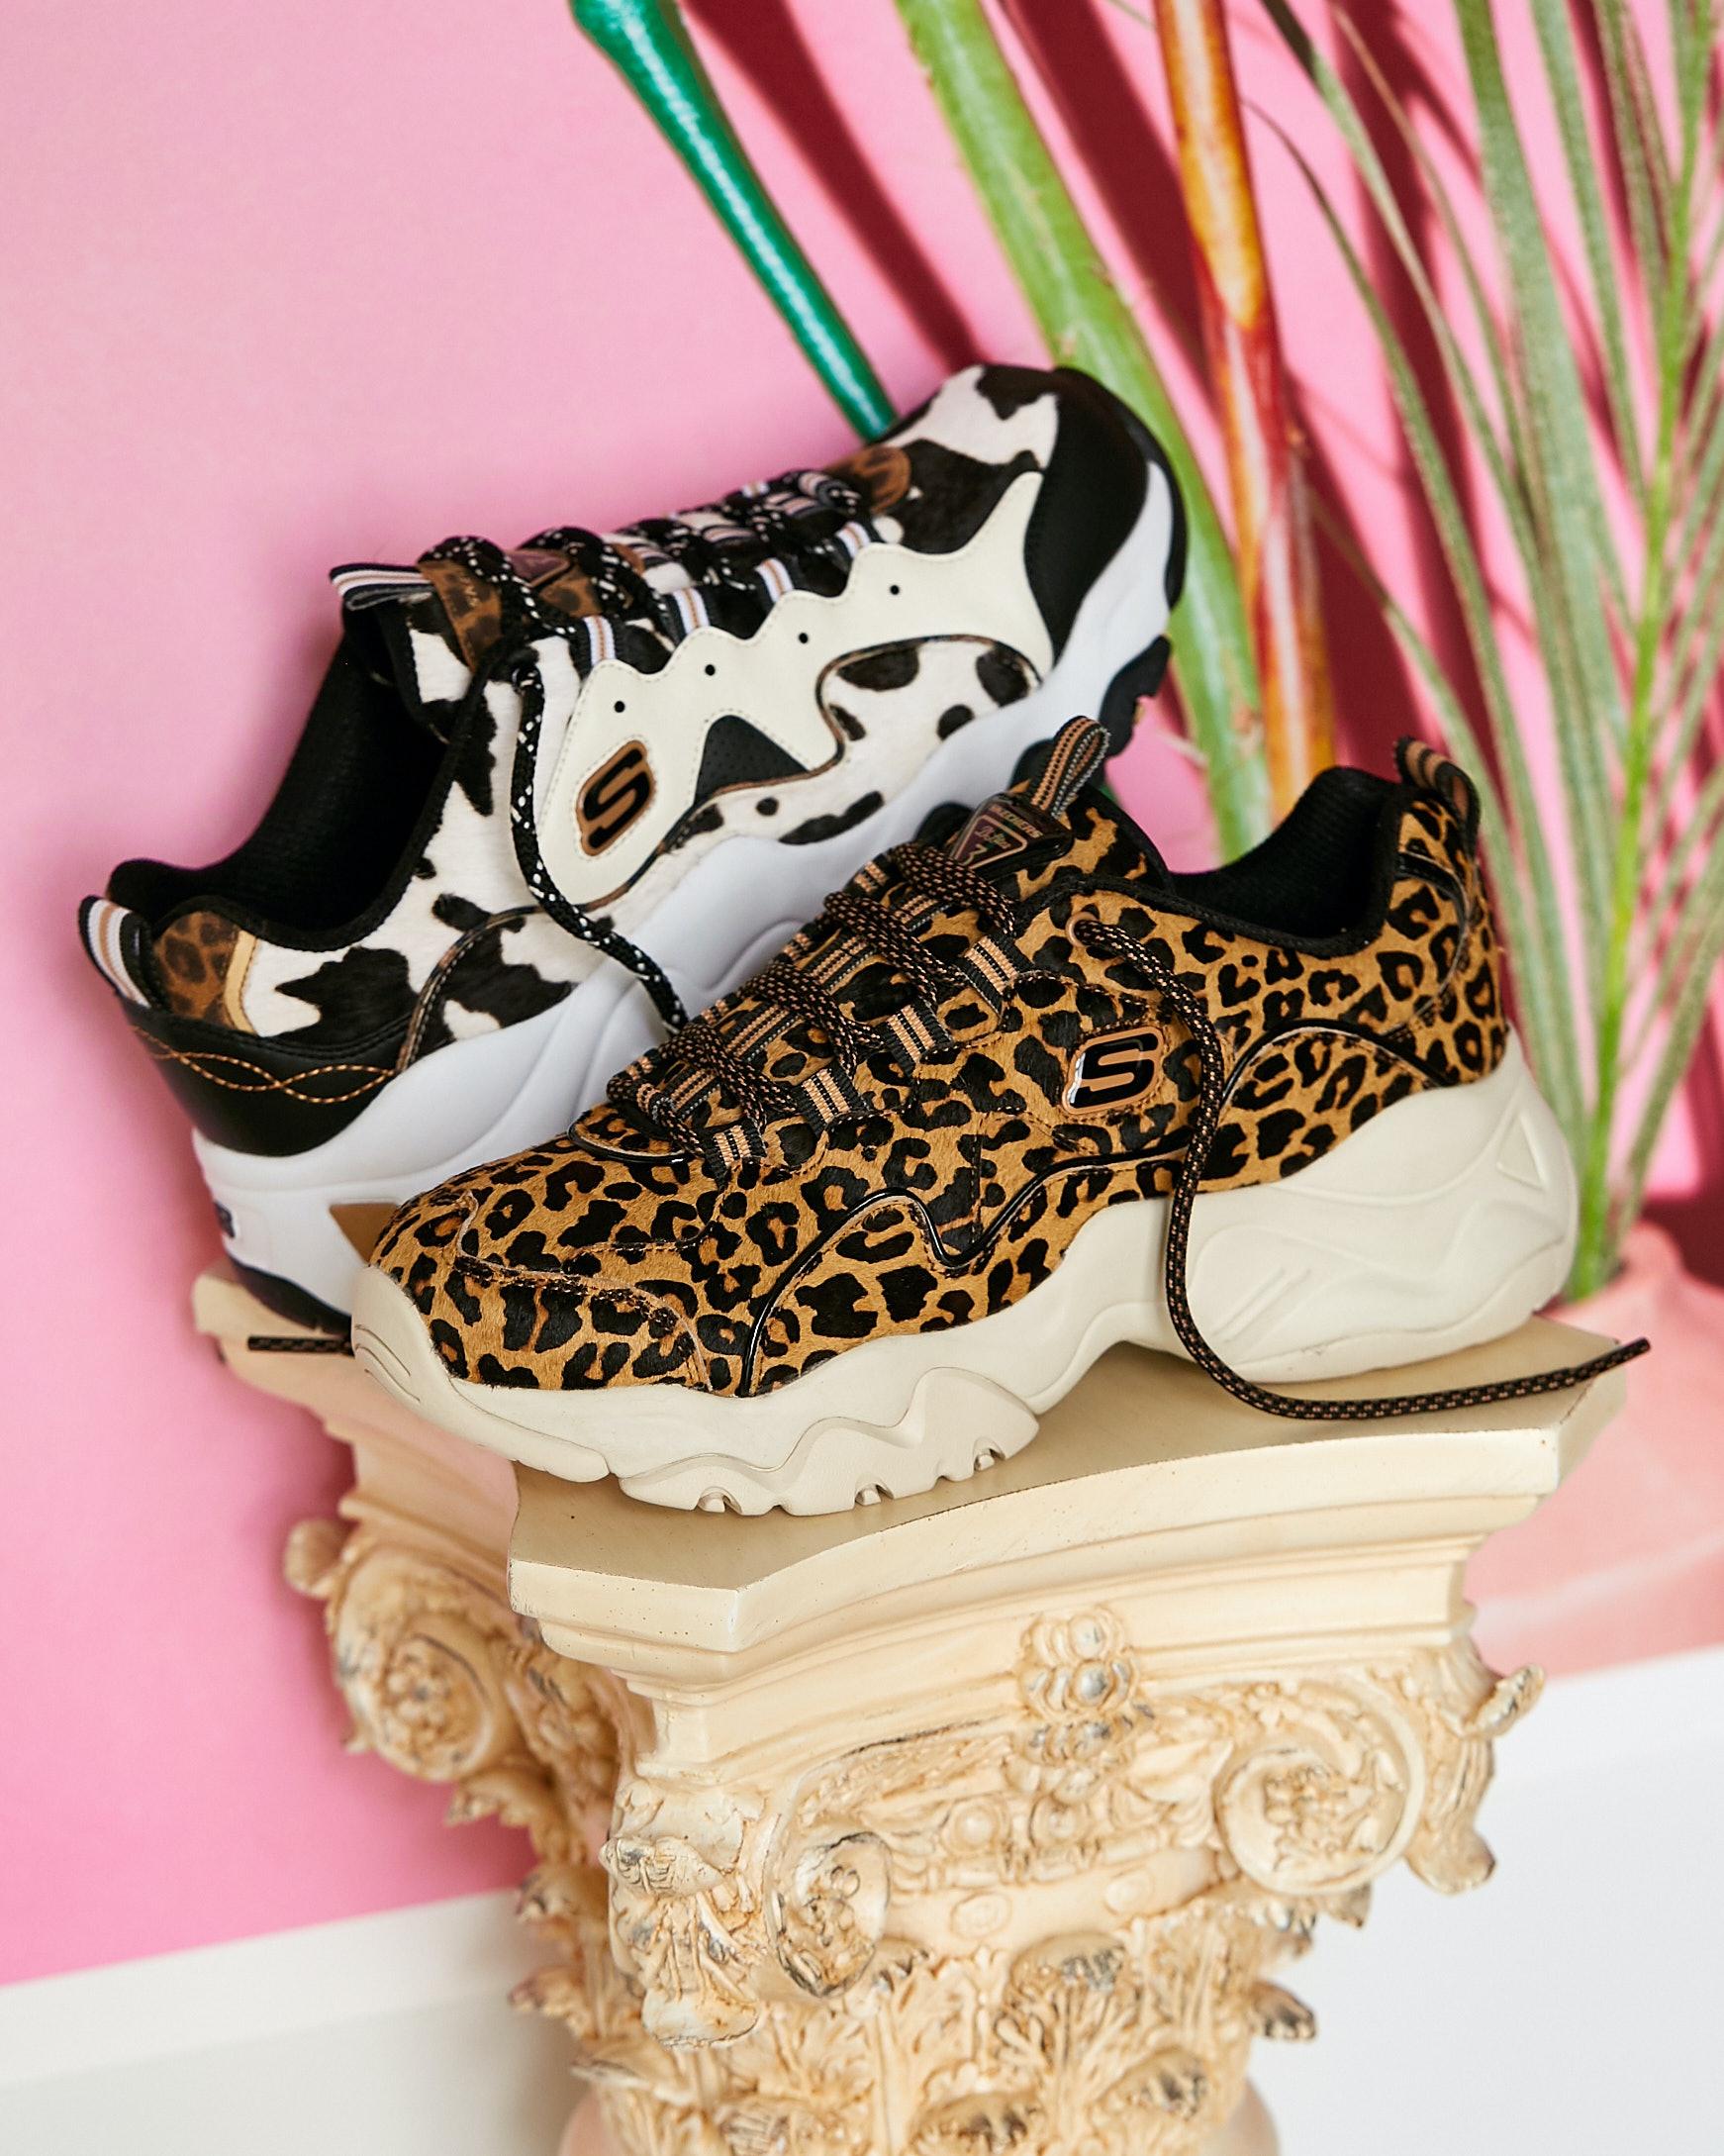 skechers shoe print